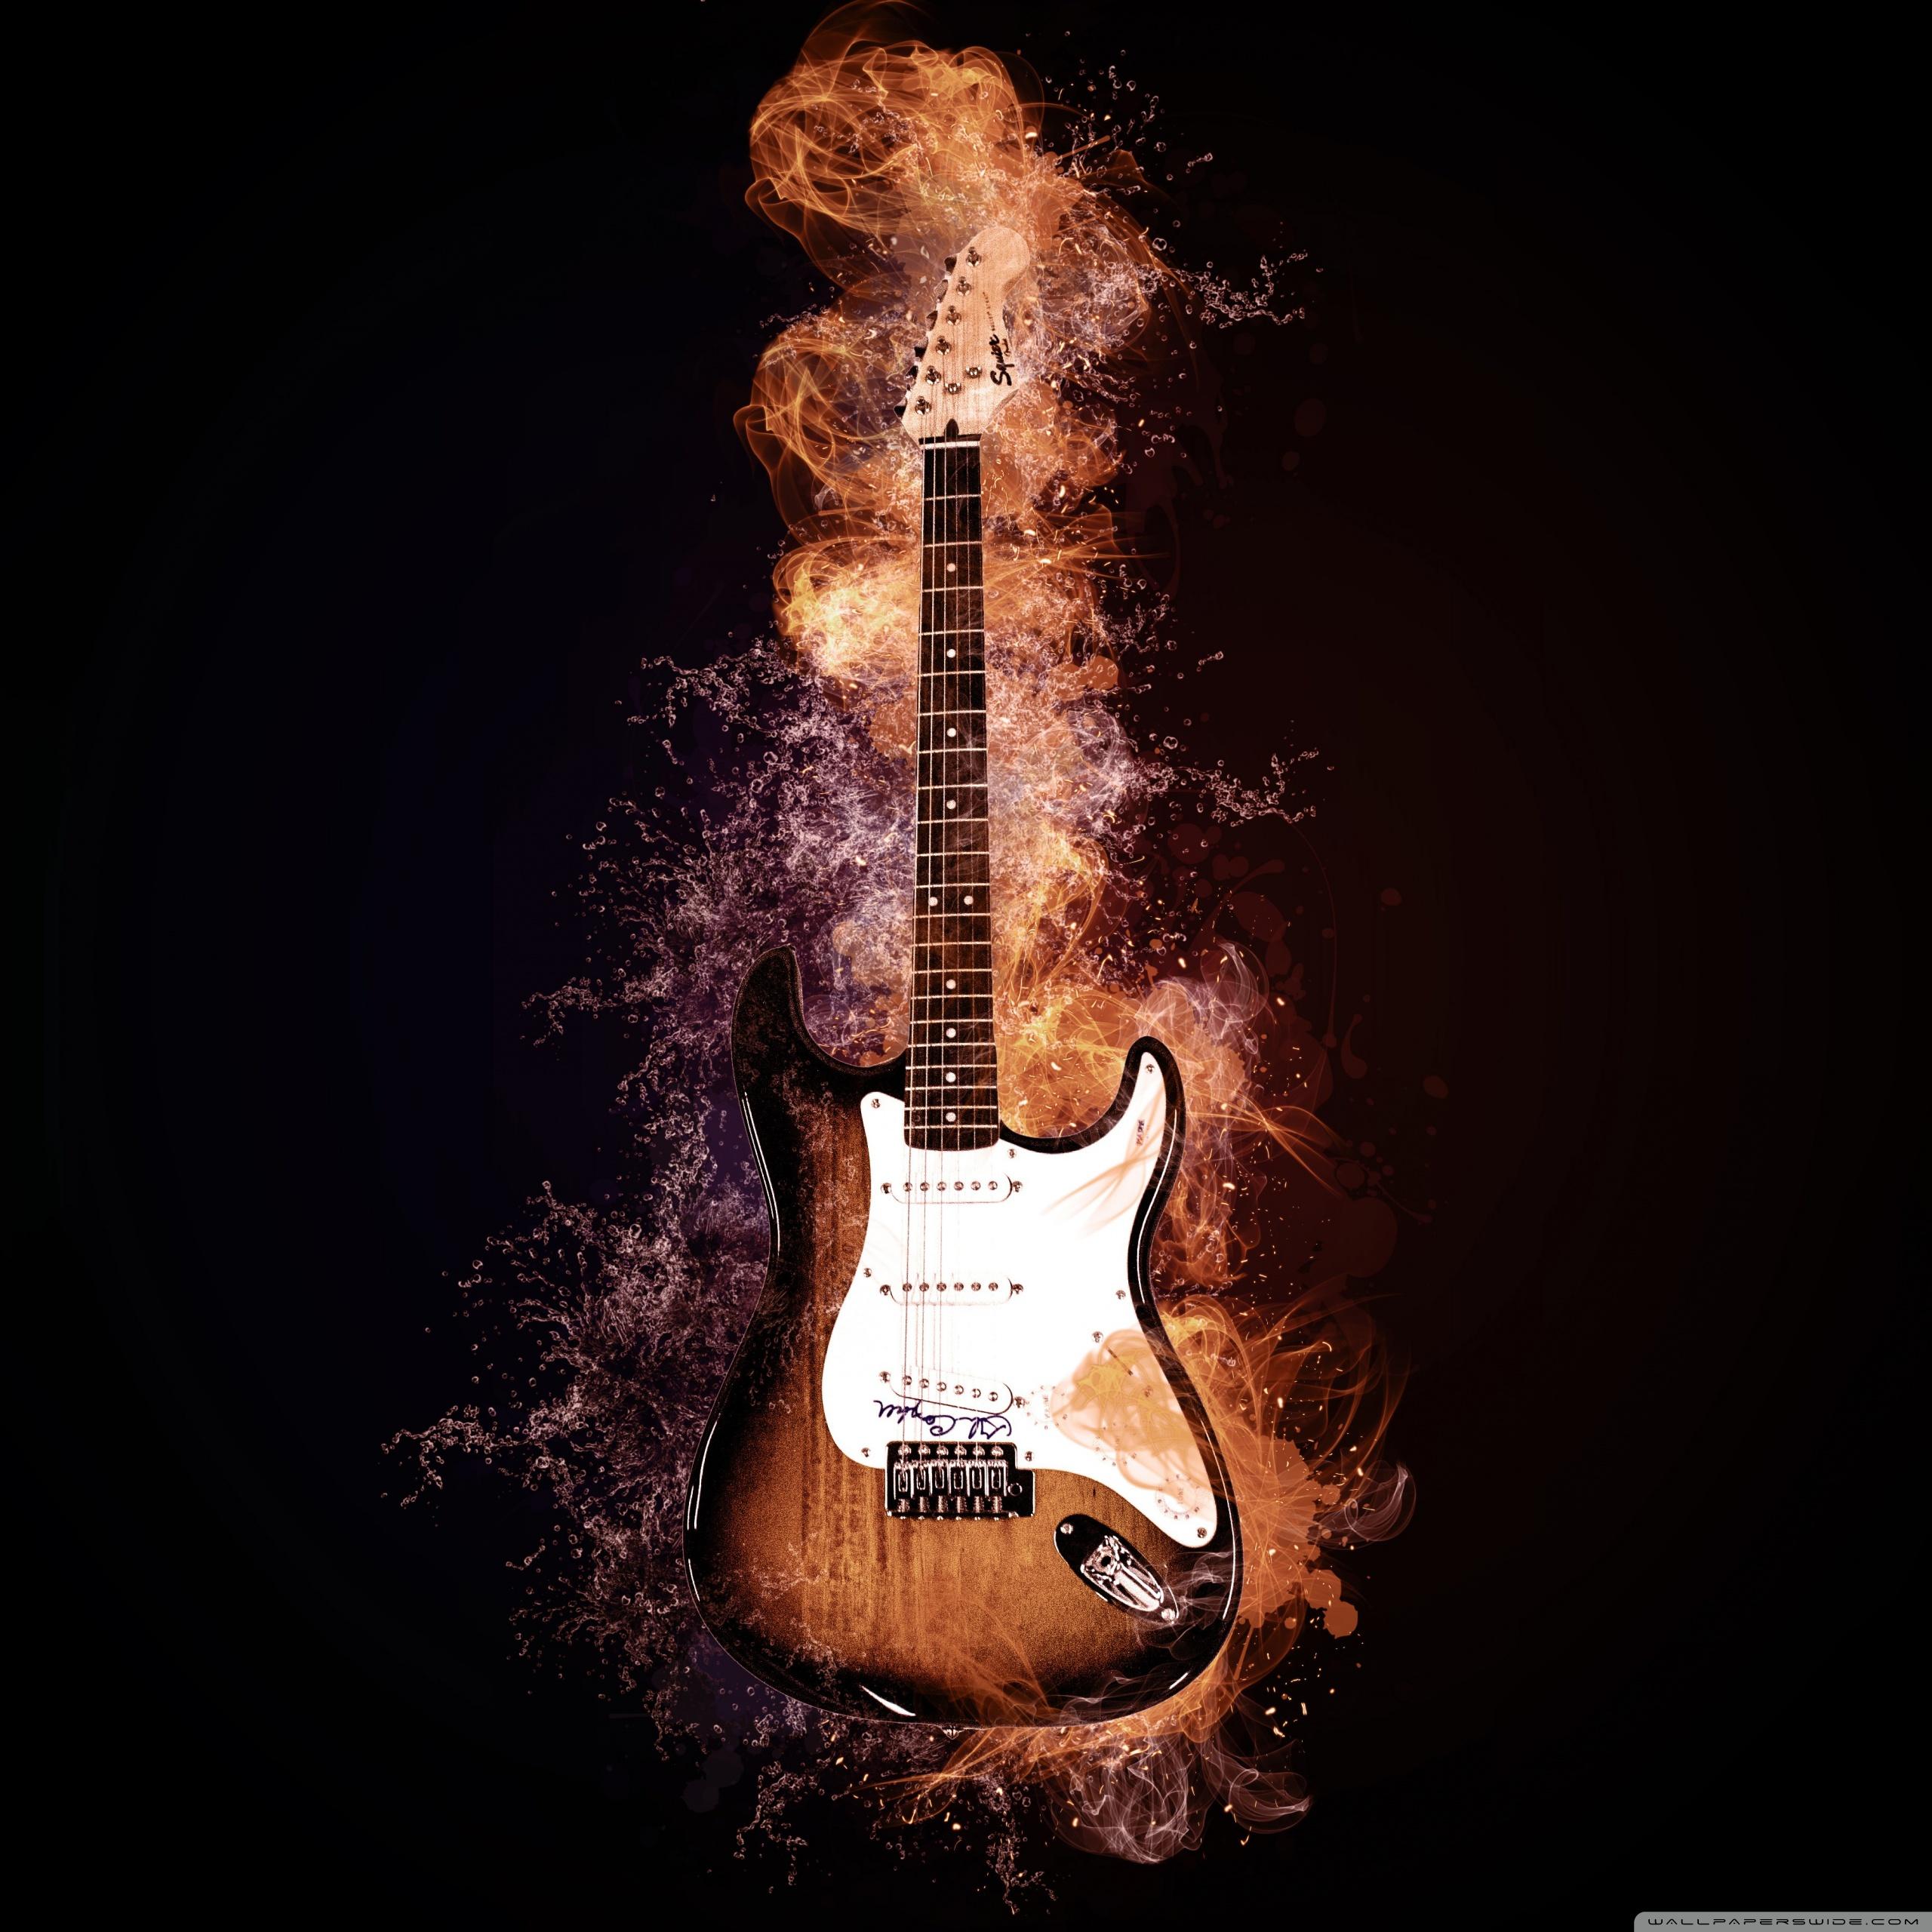 Creative Electric Guitar Ultra Hd Desktop Background Wallpaper For 4k Uhd Tv Tablet Smartphone